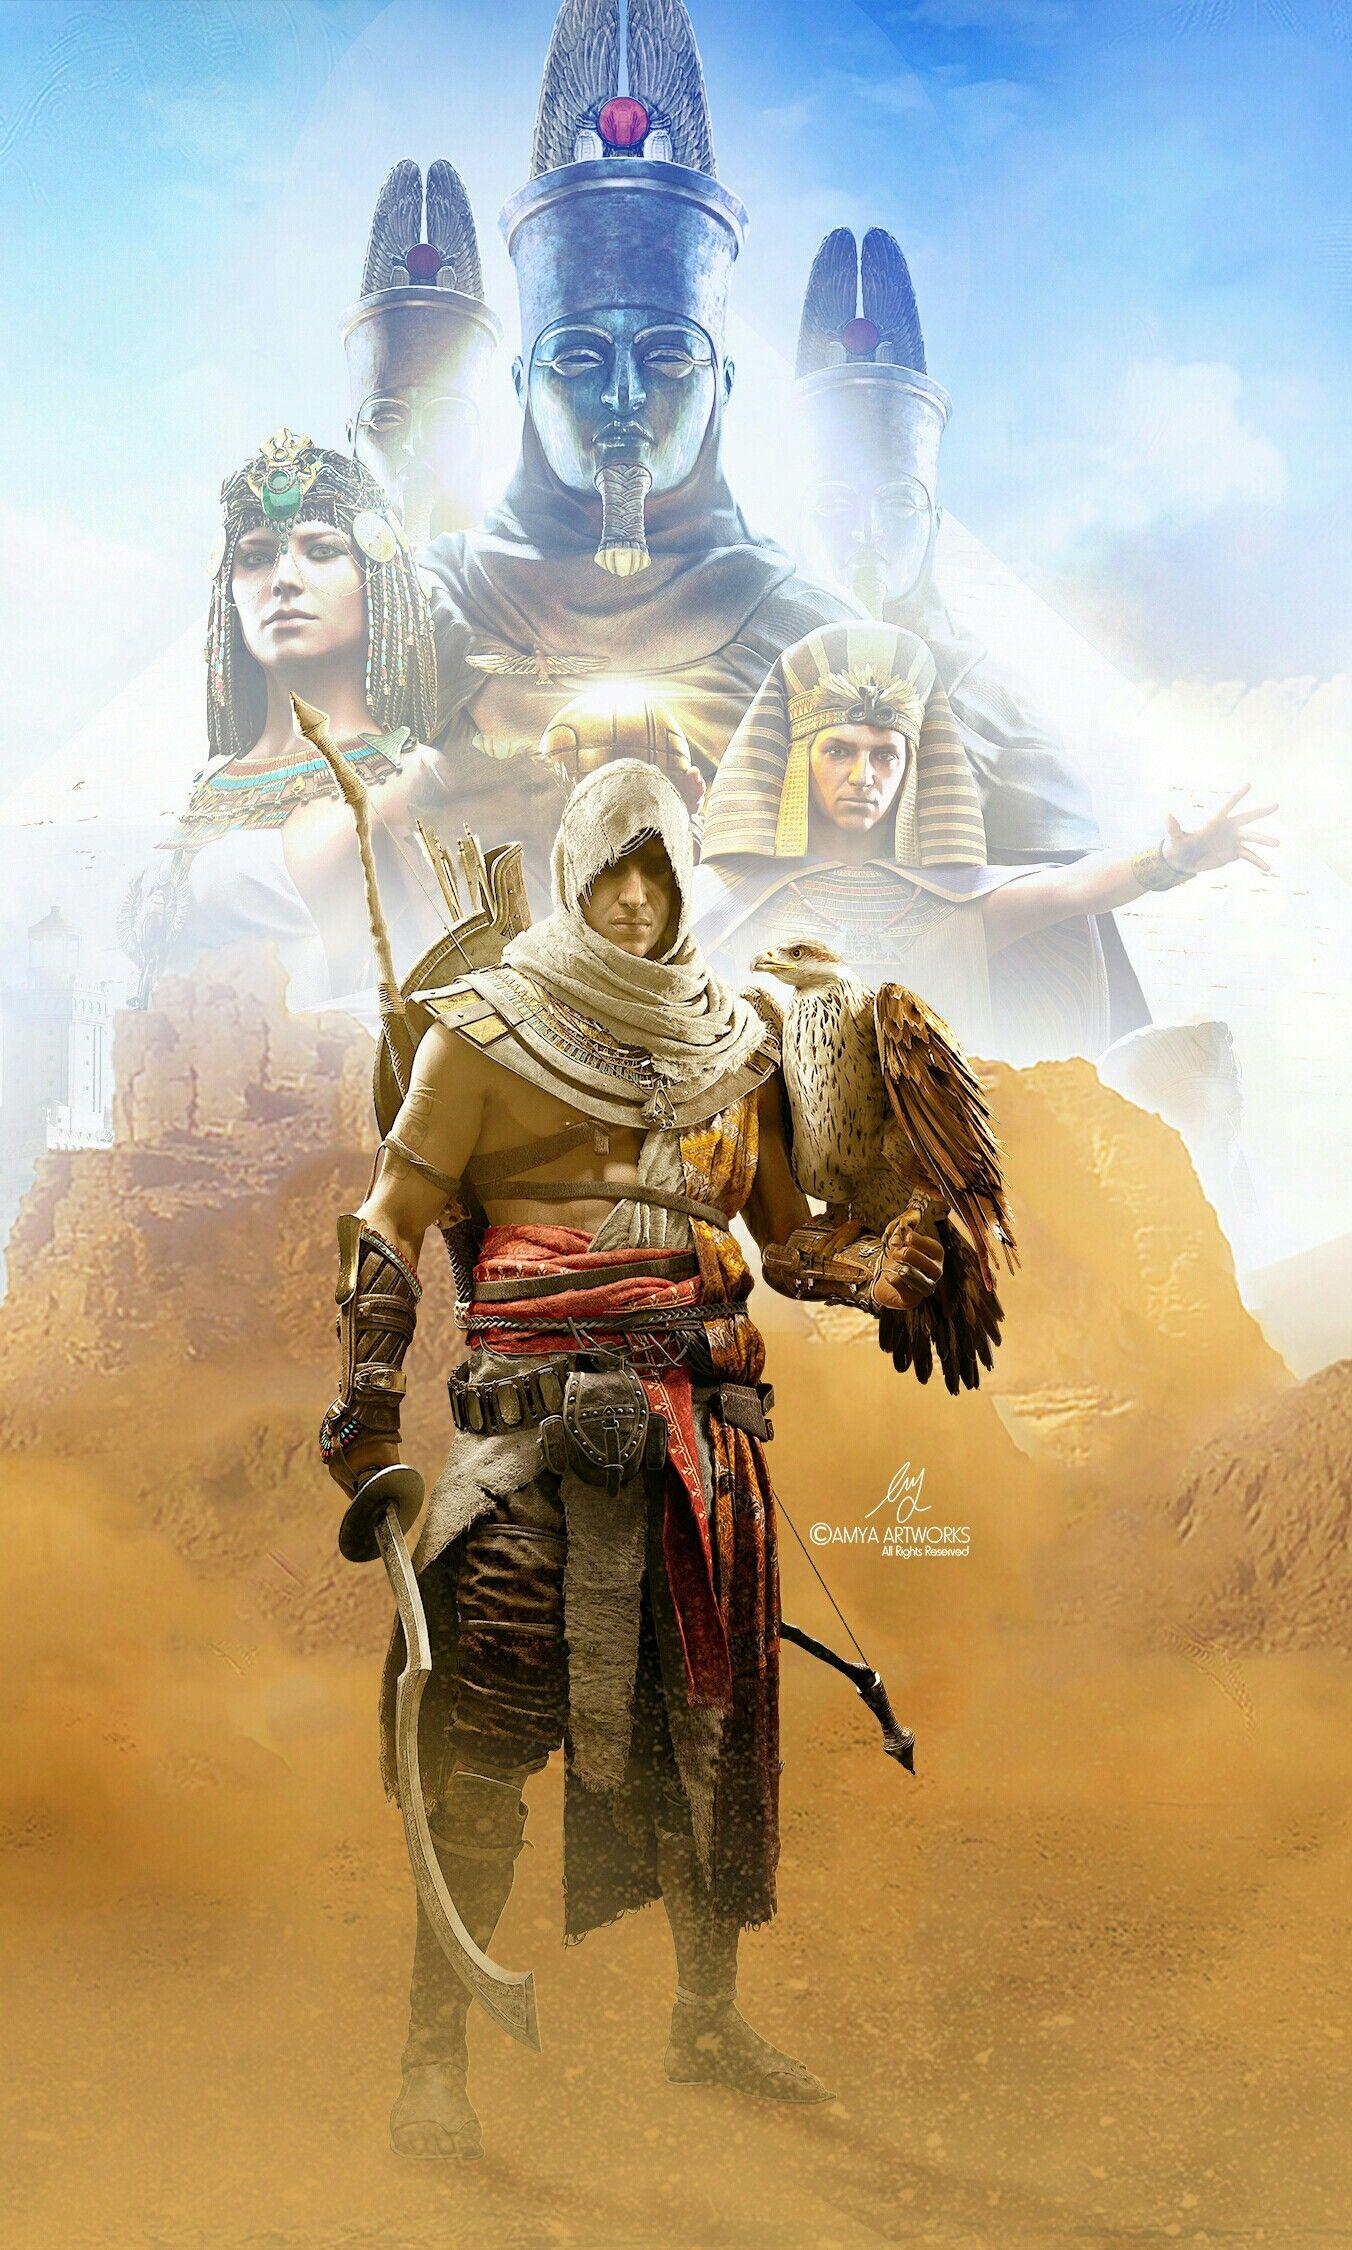 Pin By Thanujaya On Assassins Creed Assassins Creed Artwork Assassins Creed Art Assassin S Creed Wallpaper